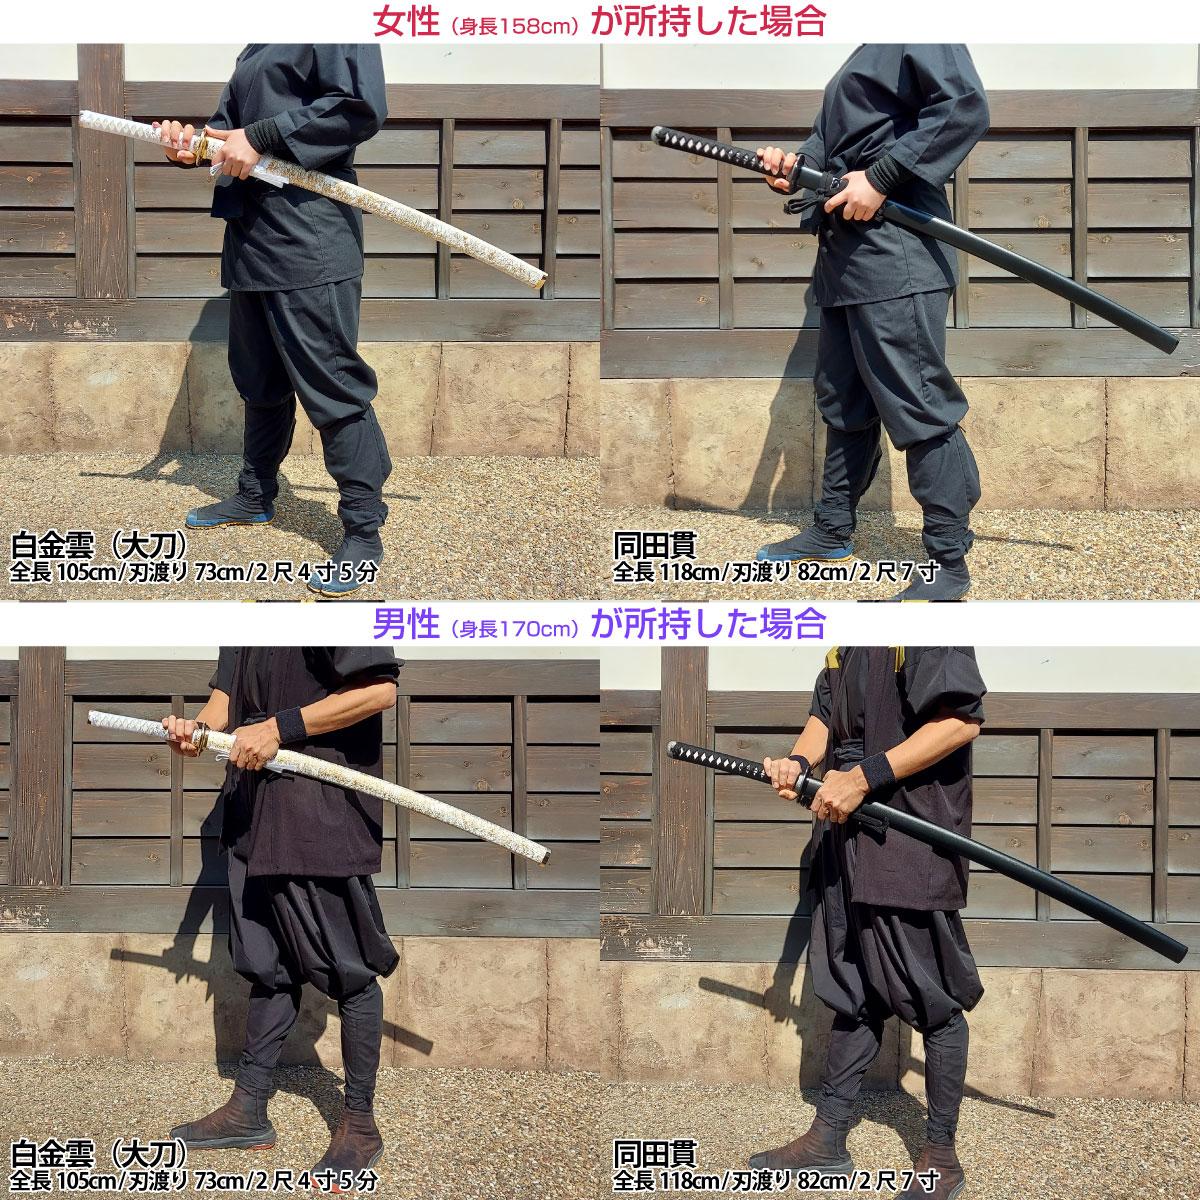 名刀伝 「鳴狐」 平造り・打刀 -最高級仕様拵え- (刀袋付き) 数量限定即納品!